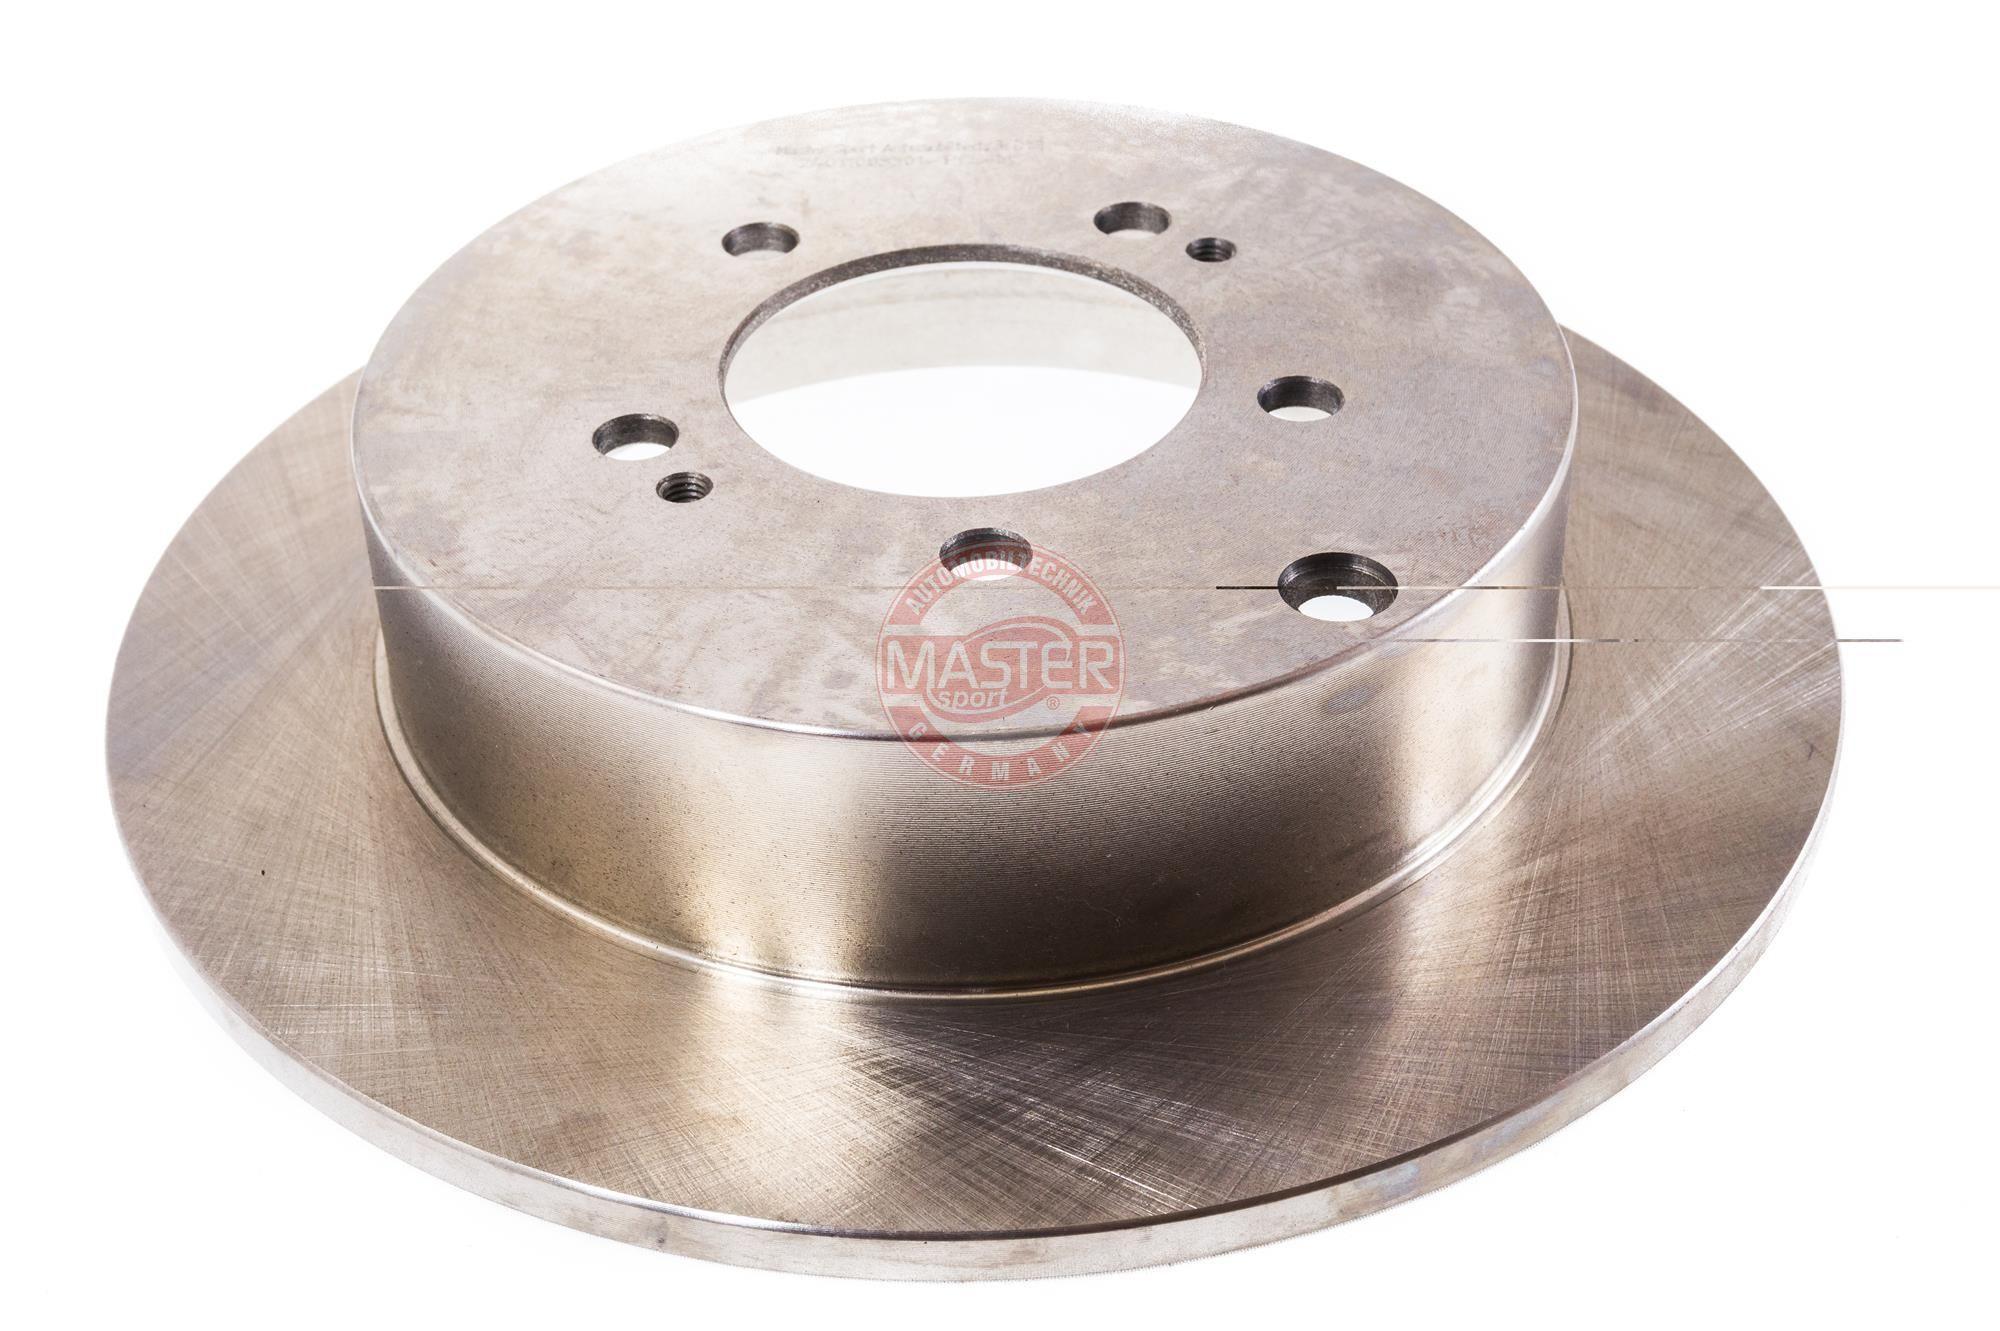 Bremsscheibe MASTER-SPORT 24011003301-PCS-MS Bewertungen